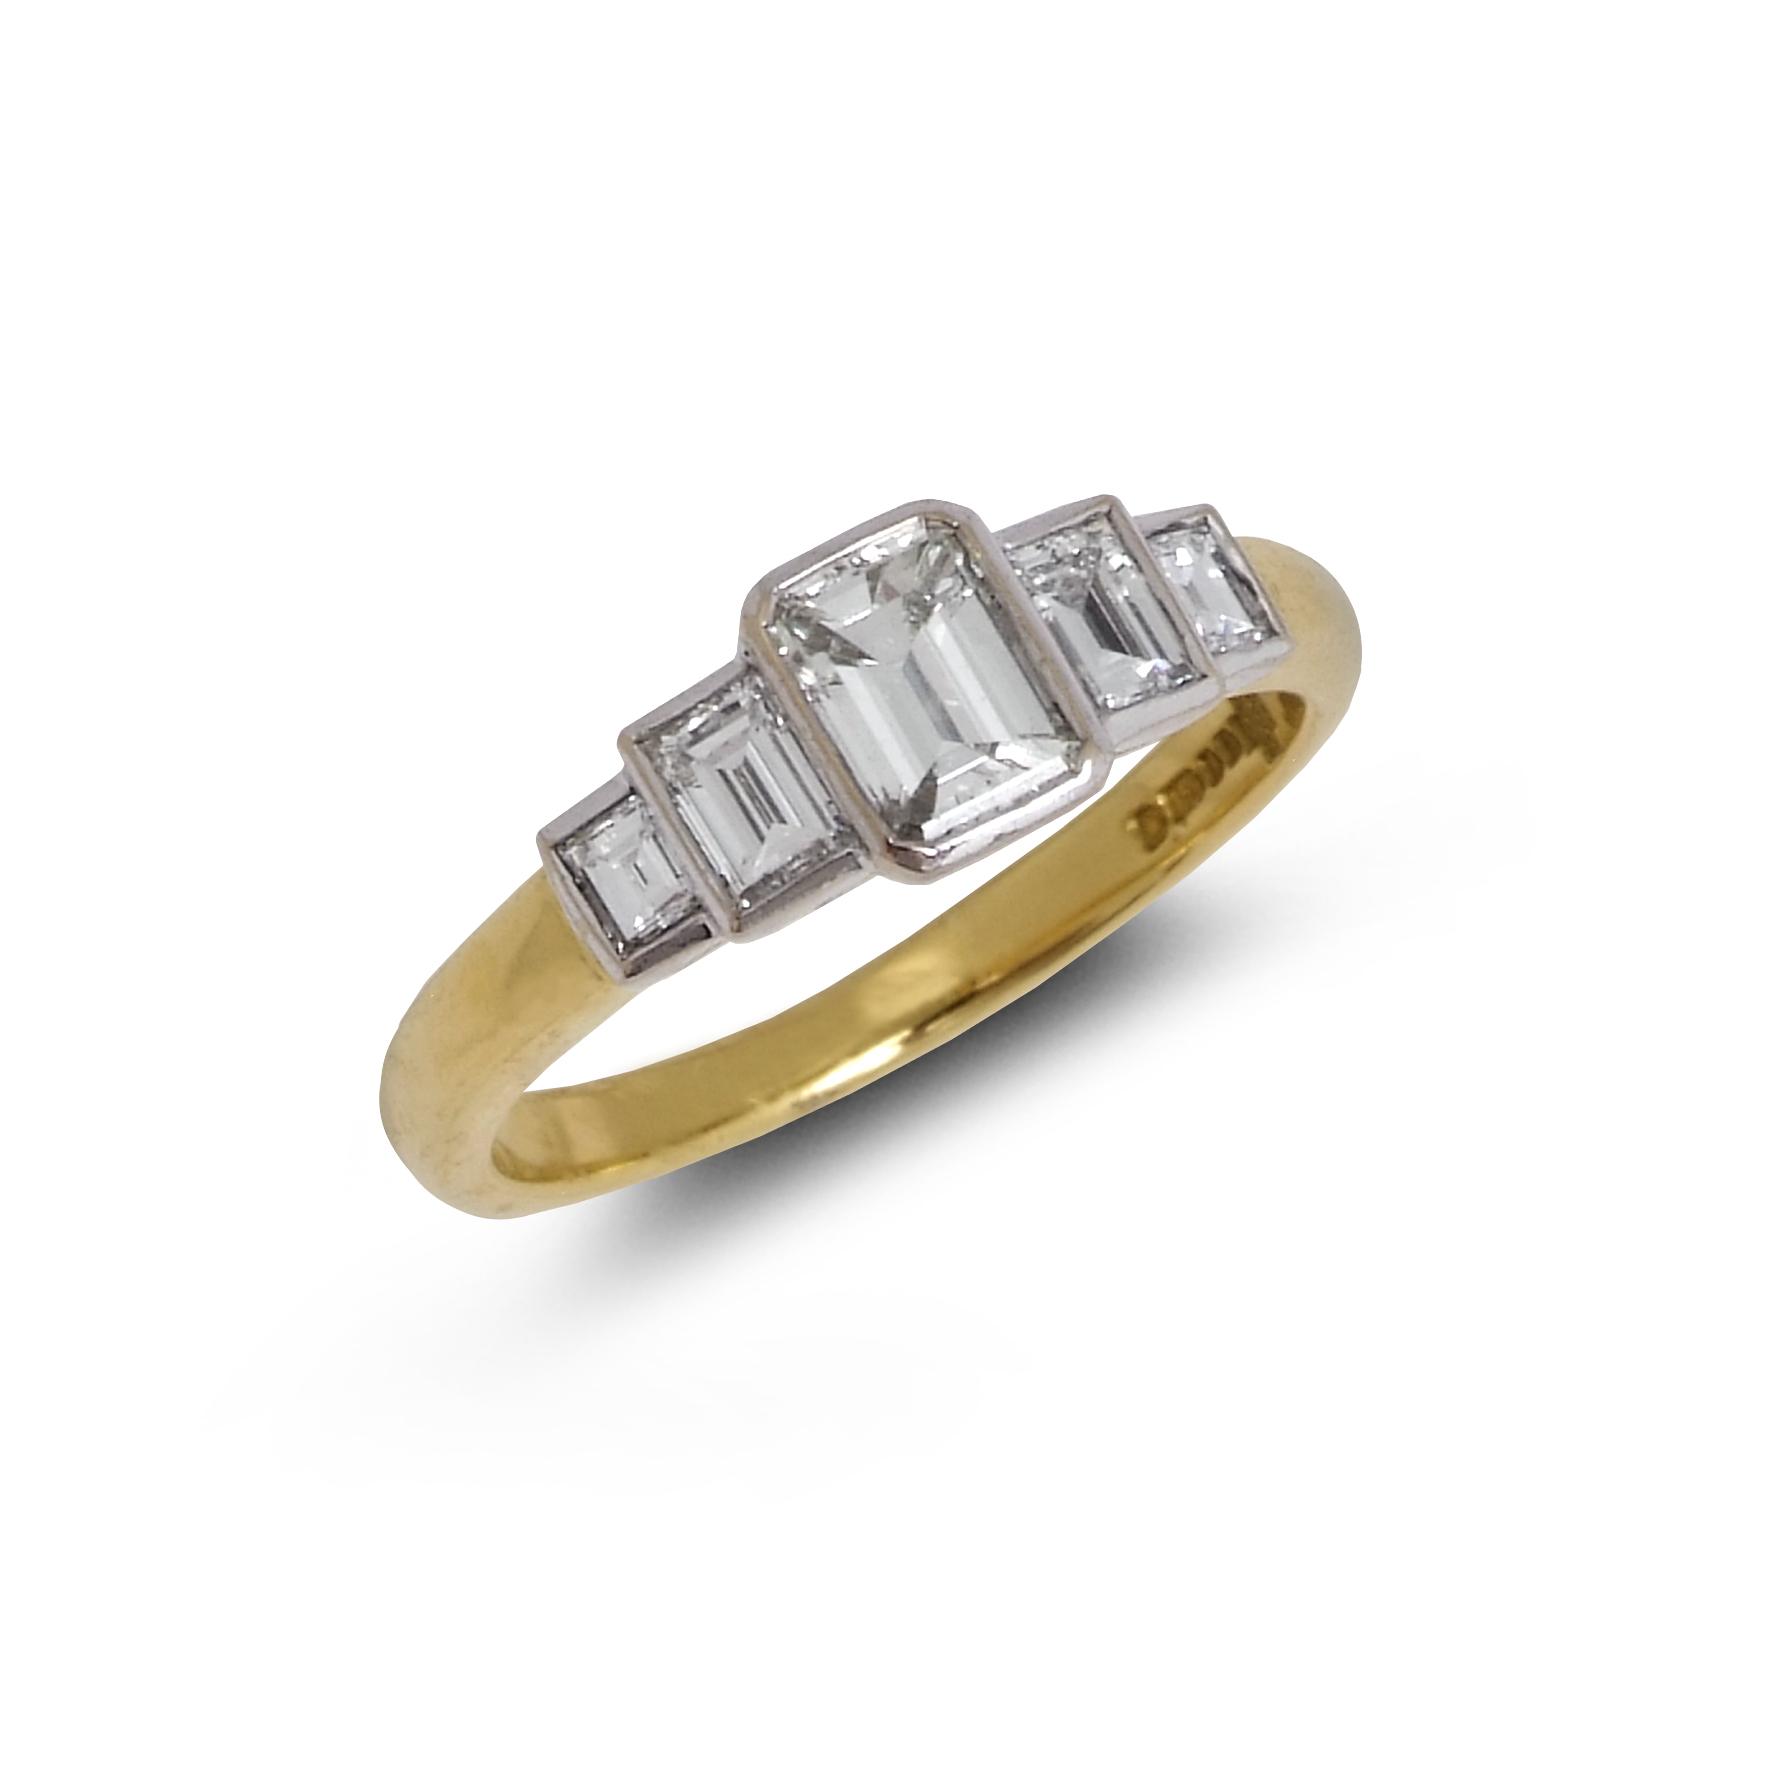 Vintage emerald-cut diamond five-stone ring